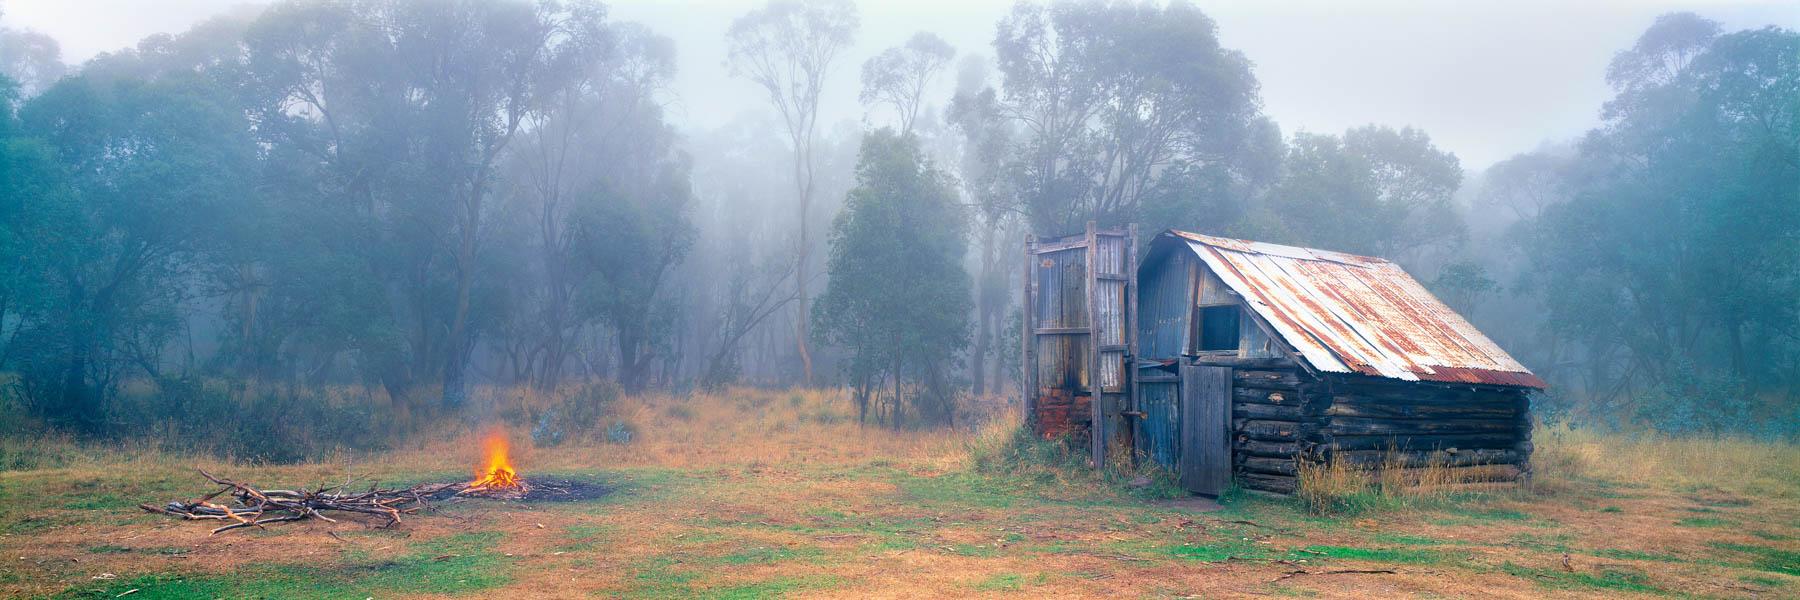 A cold, misty morning at Moroka Hut, Alpine National Park, Victoria, Australia.